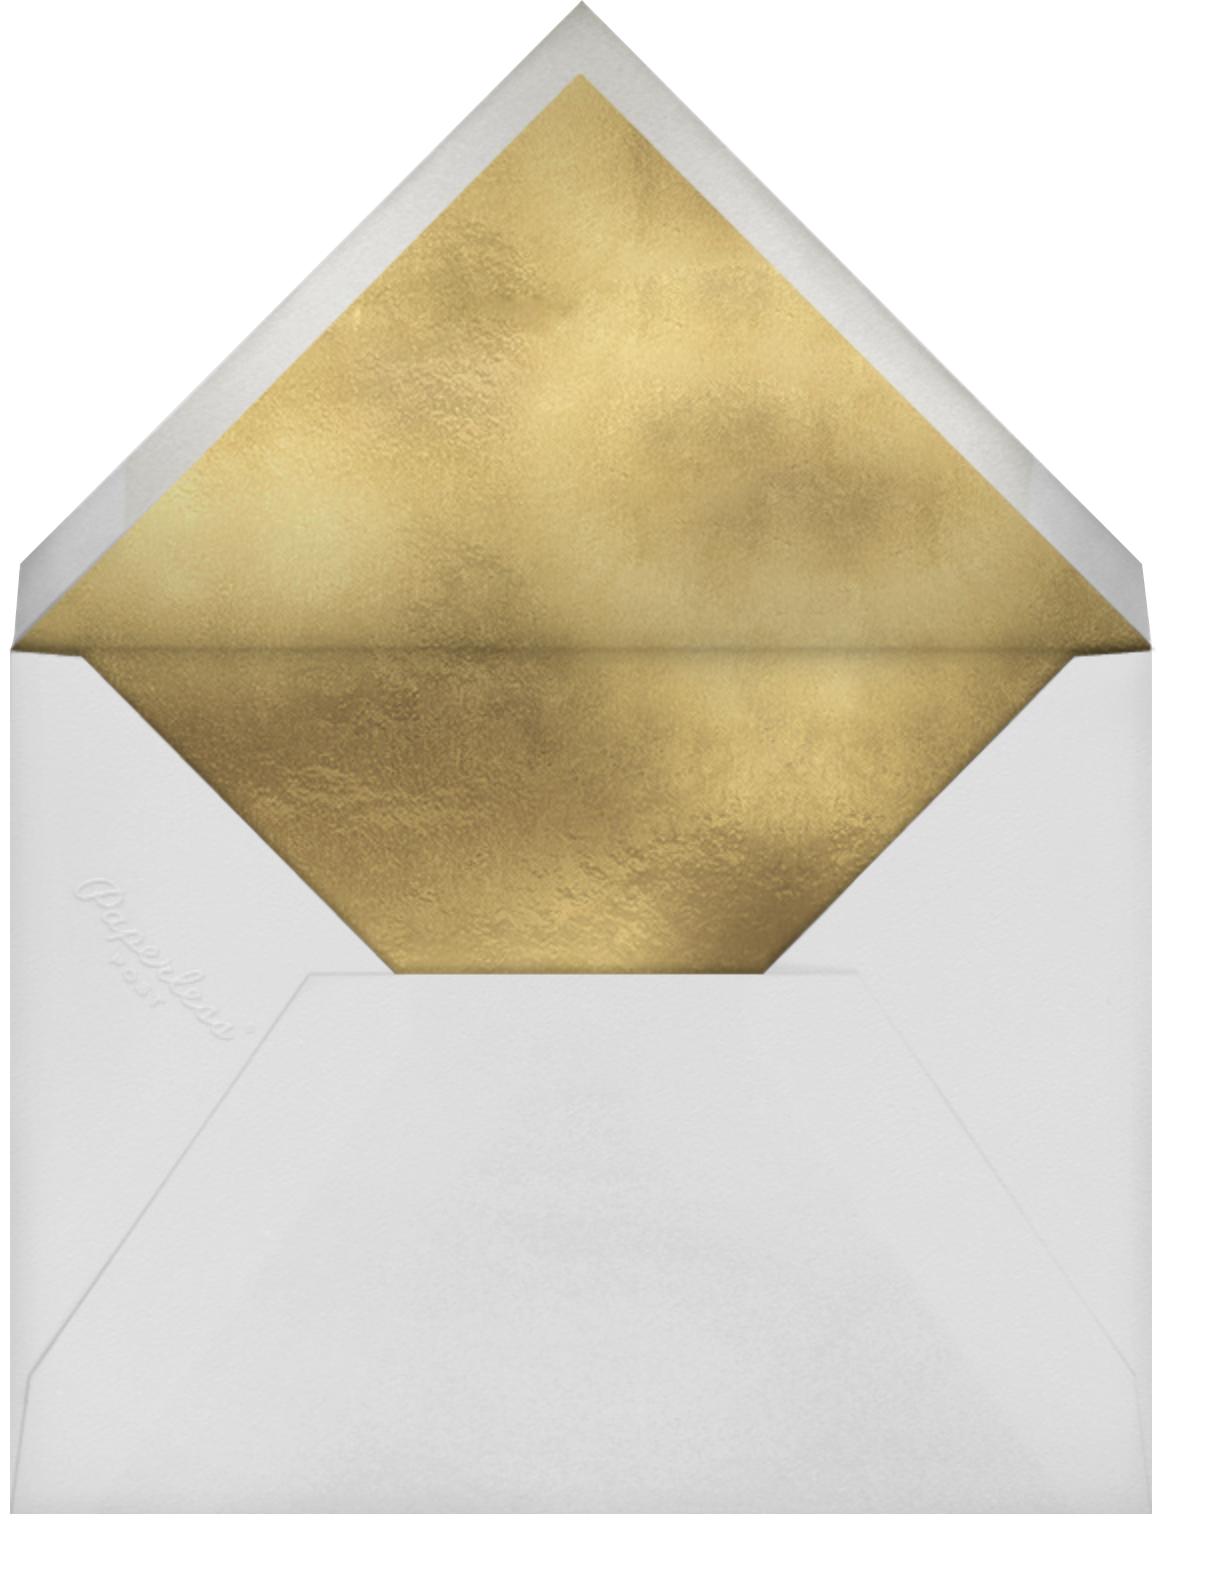 Peonies Burnt Sienna - Rifle Paper Co. - Thanksgiving - envelope back